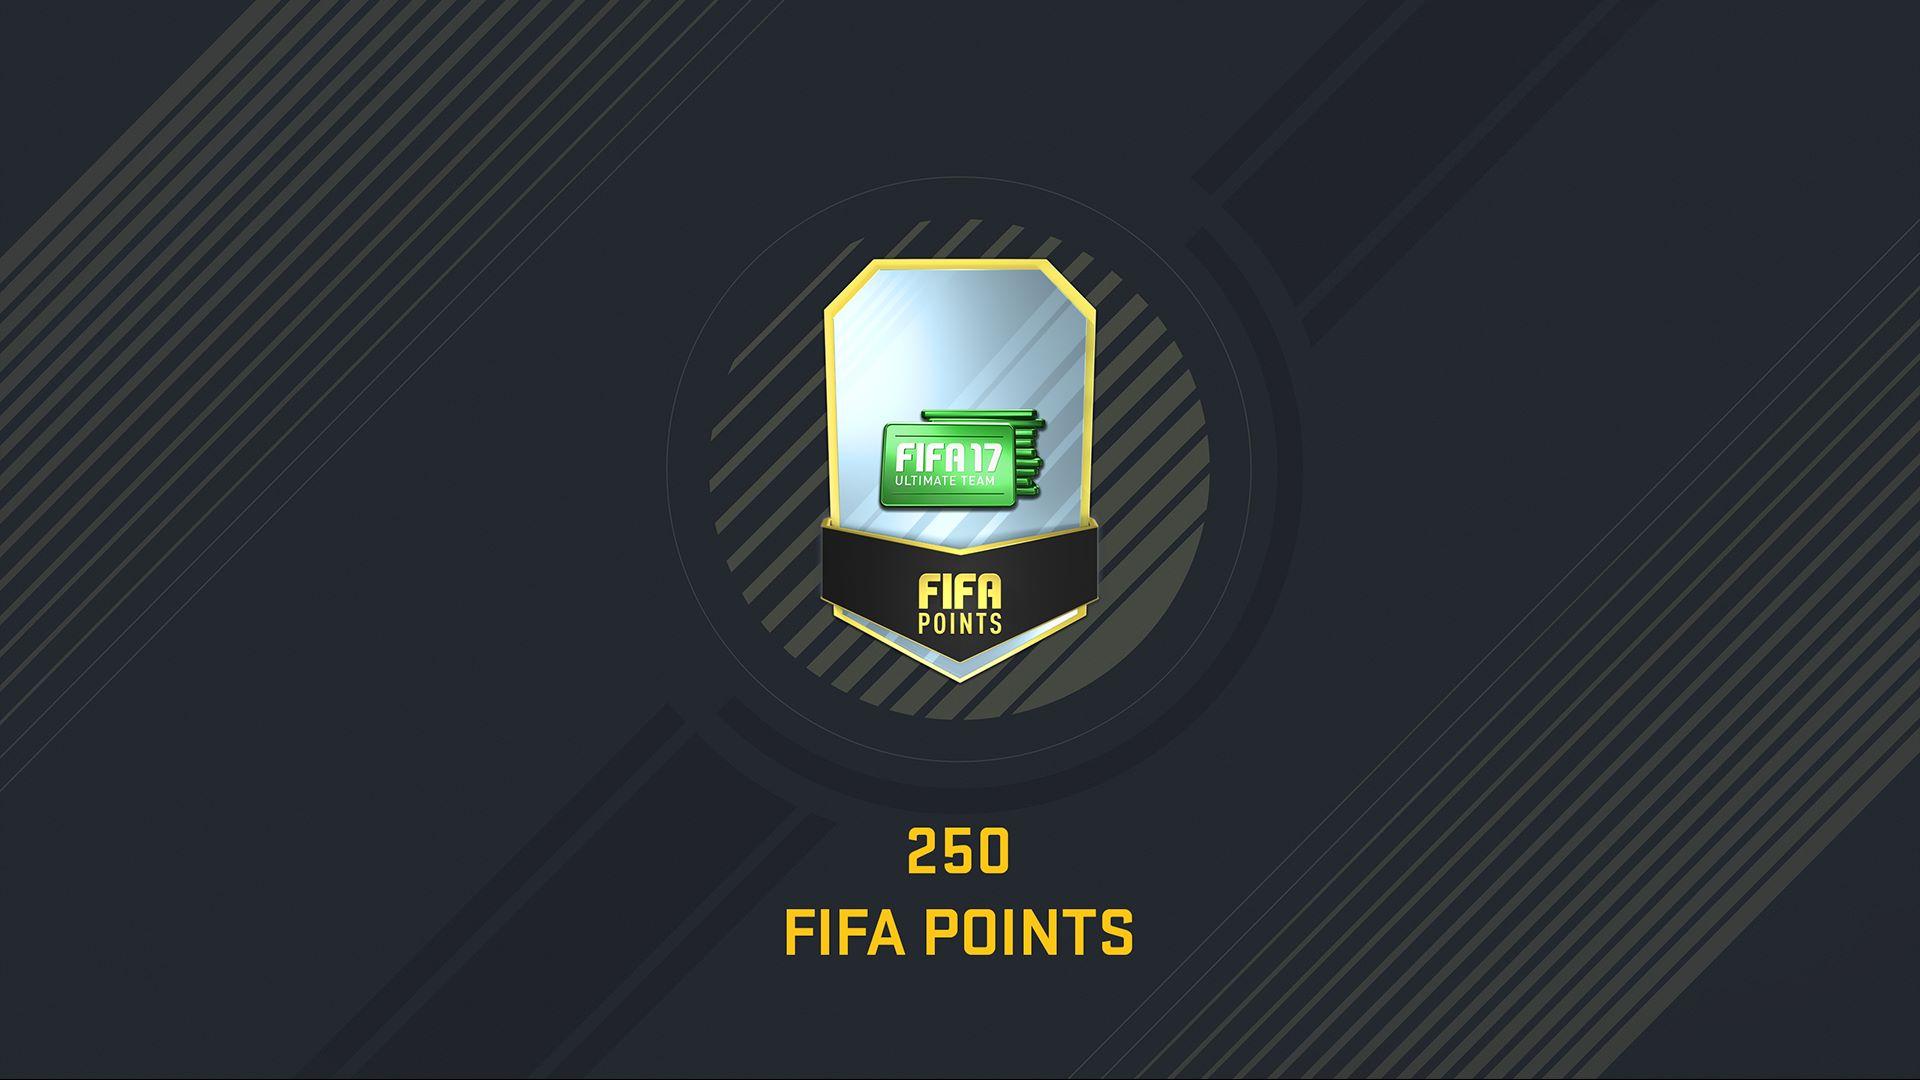 250 FIFA 17 Points